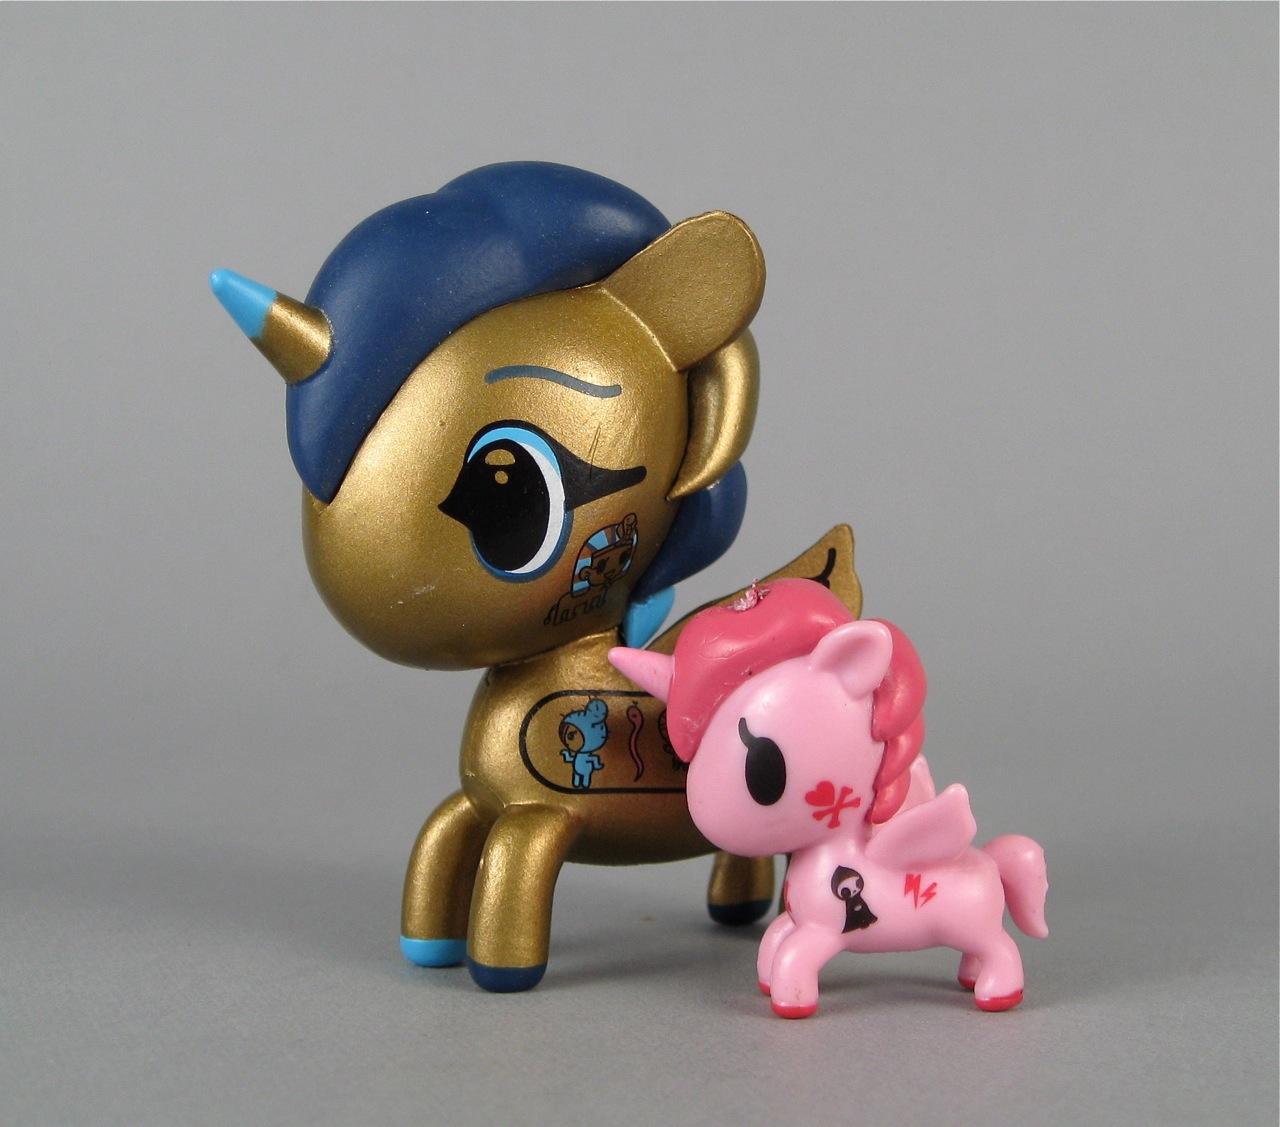 Unicorno and Unicorno Frenzies